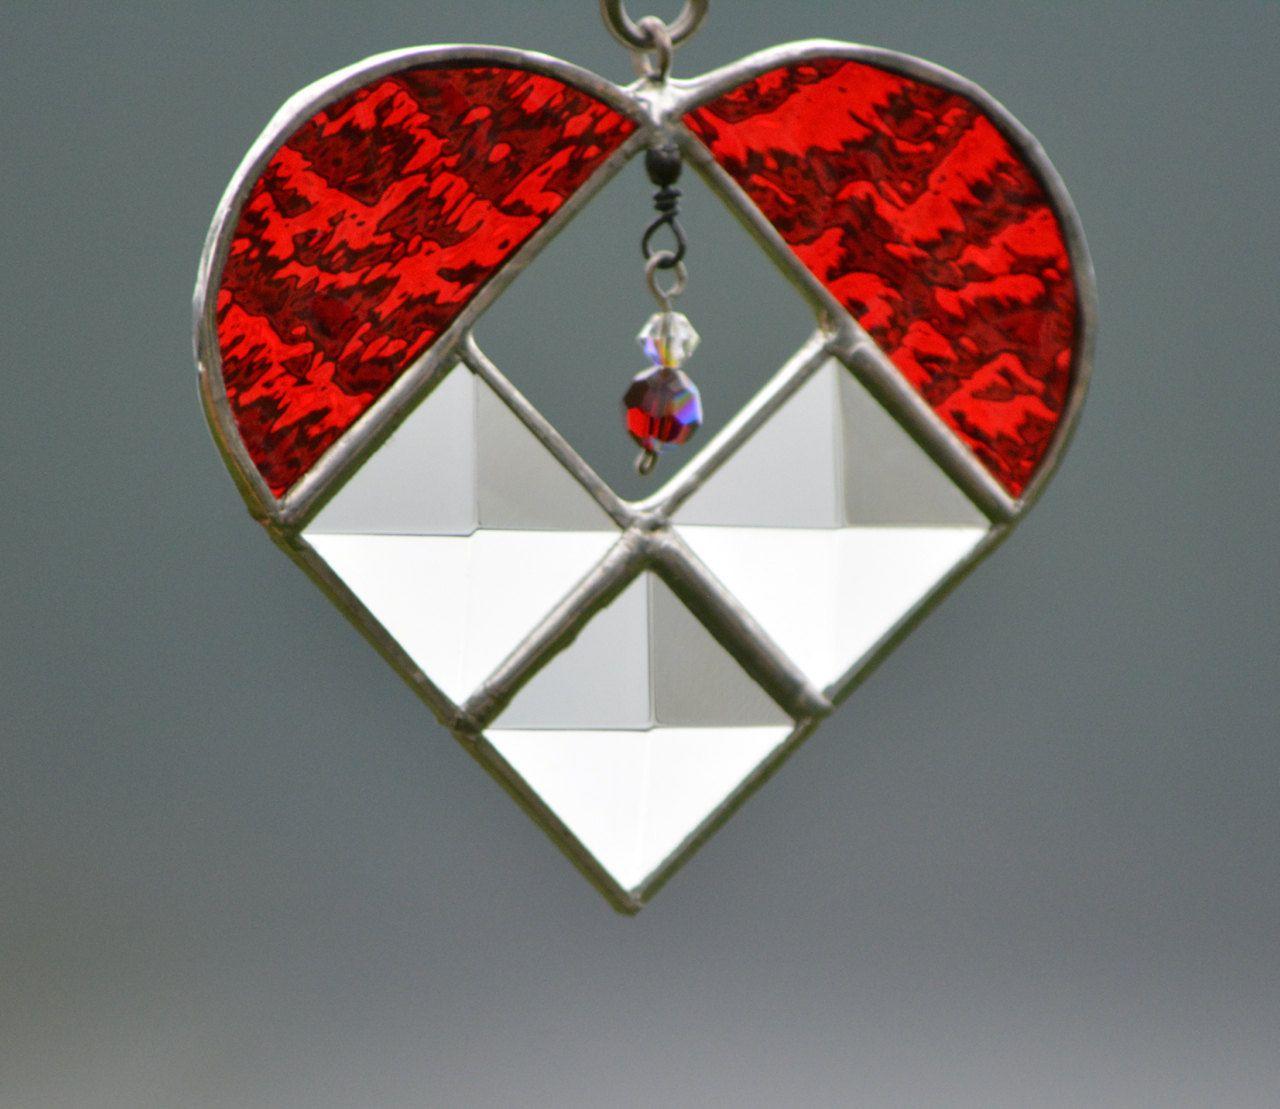 Miniature crystal ornaments - Stained Glass Heart Suncatcher Christmas Tree Ornament Miniature Heart Swarovski Crystal Ruby